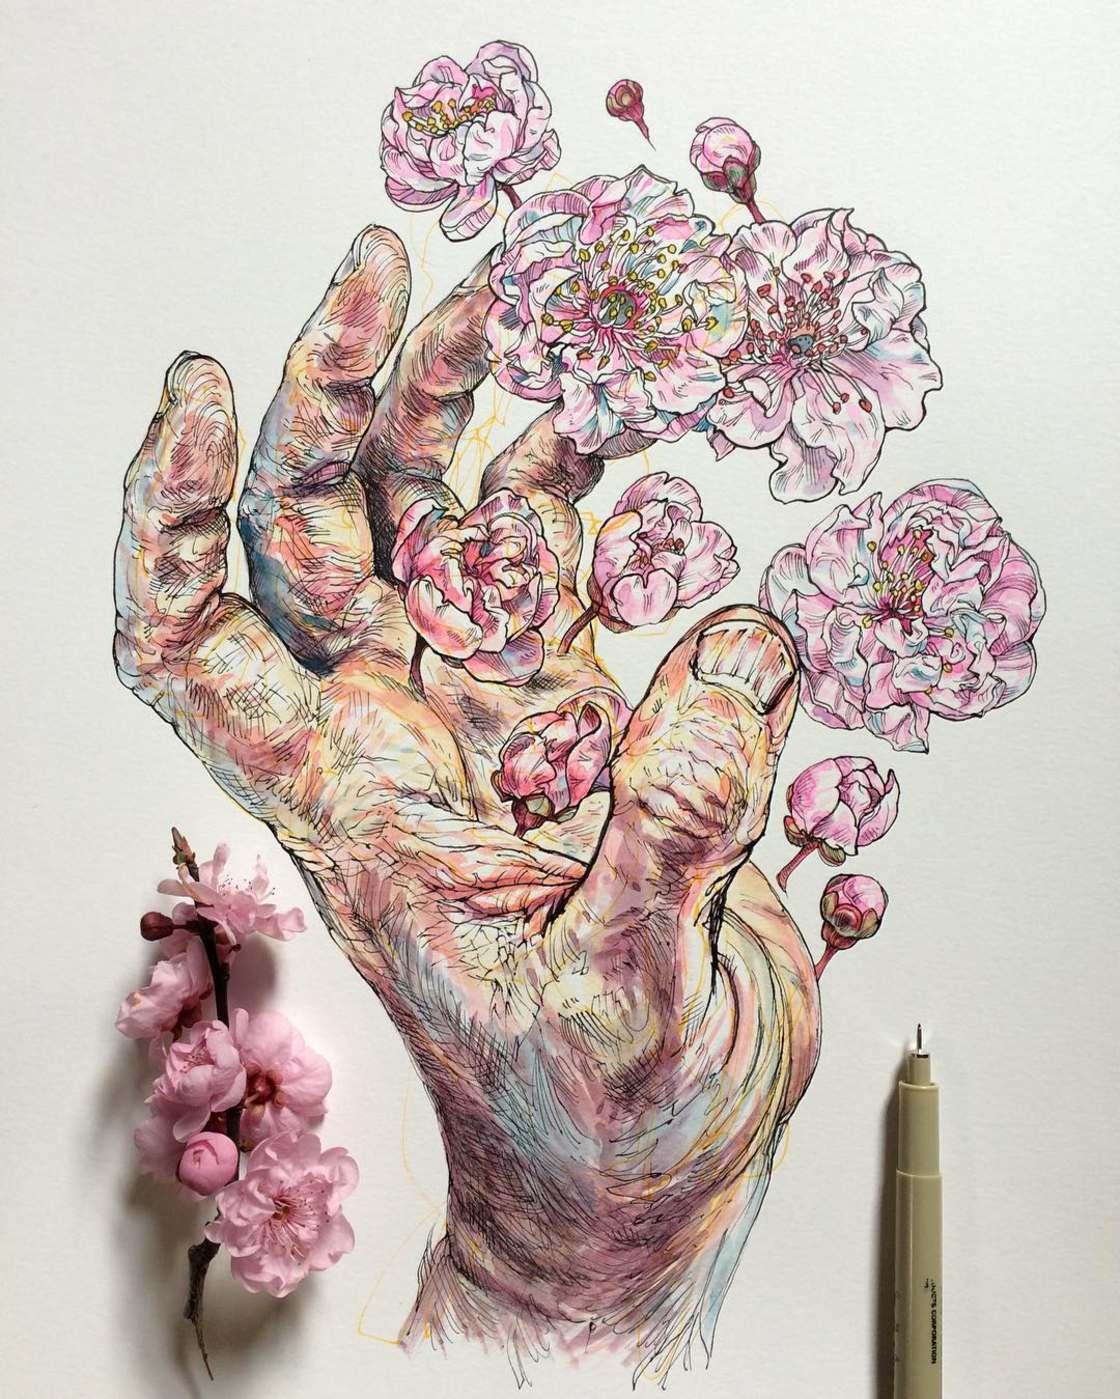 Hands and Flowers – Les illustrations poetiques de Noel Badges Pugh (18 pics)